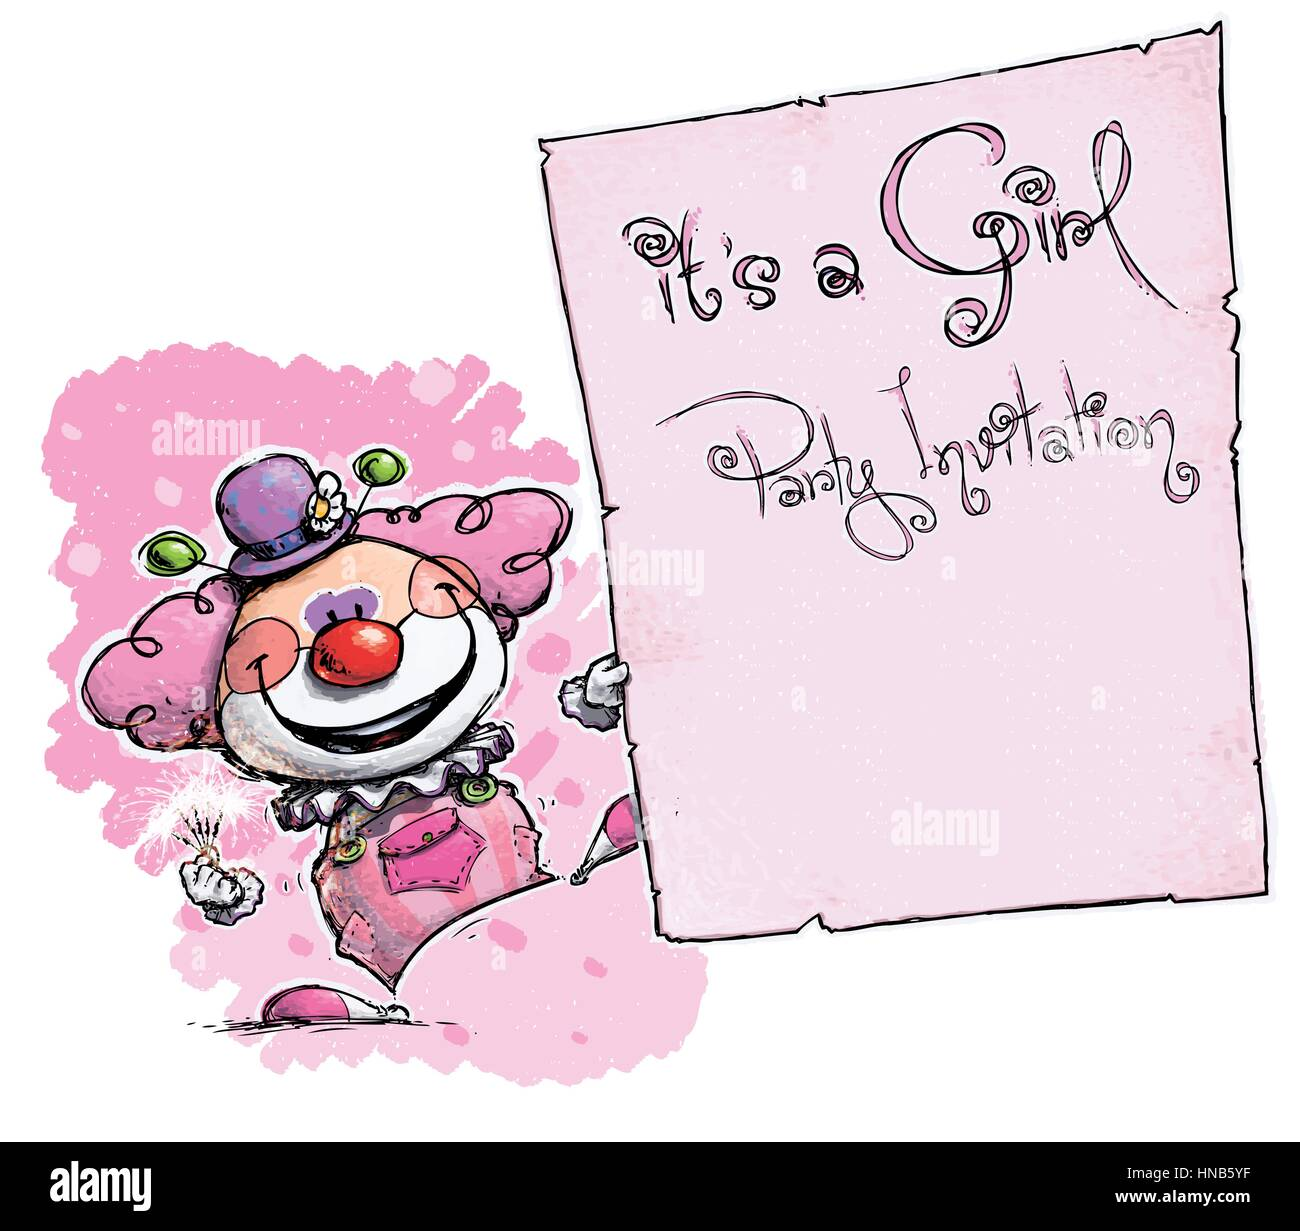 Cartoonartistic illustration of a clown holding an its a girl cartoonartistic illustration of a clown holding an its a girl party invitation monicamarmolfo Choice Image